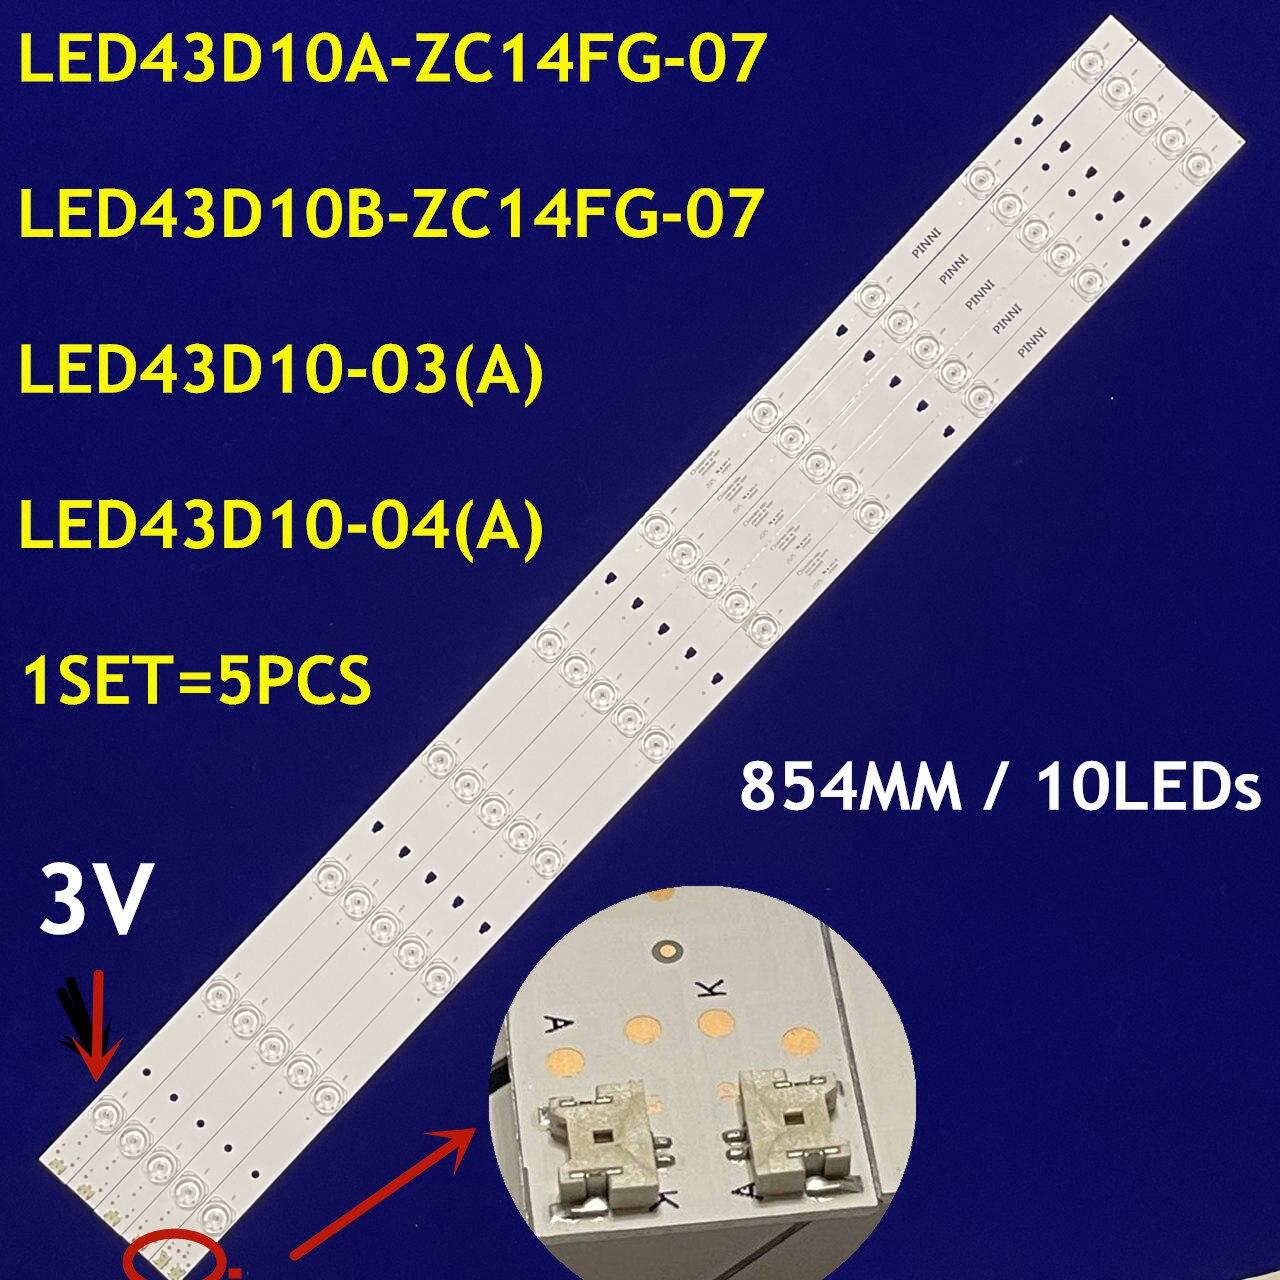 LED الخلفية قطاع LED43D10A-ZC14FG-07 LED43D10B-ZC14FG-07 LED43D10-03(А )LED43D10-04(A) 30343010202/01For LG 43